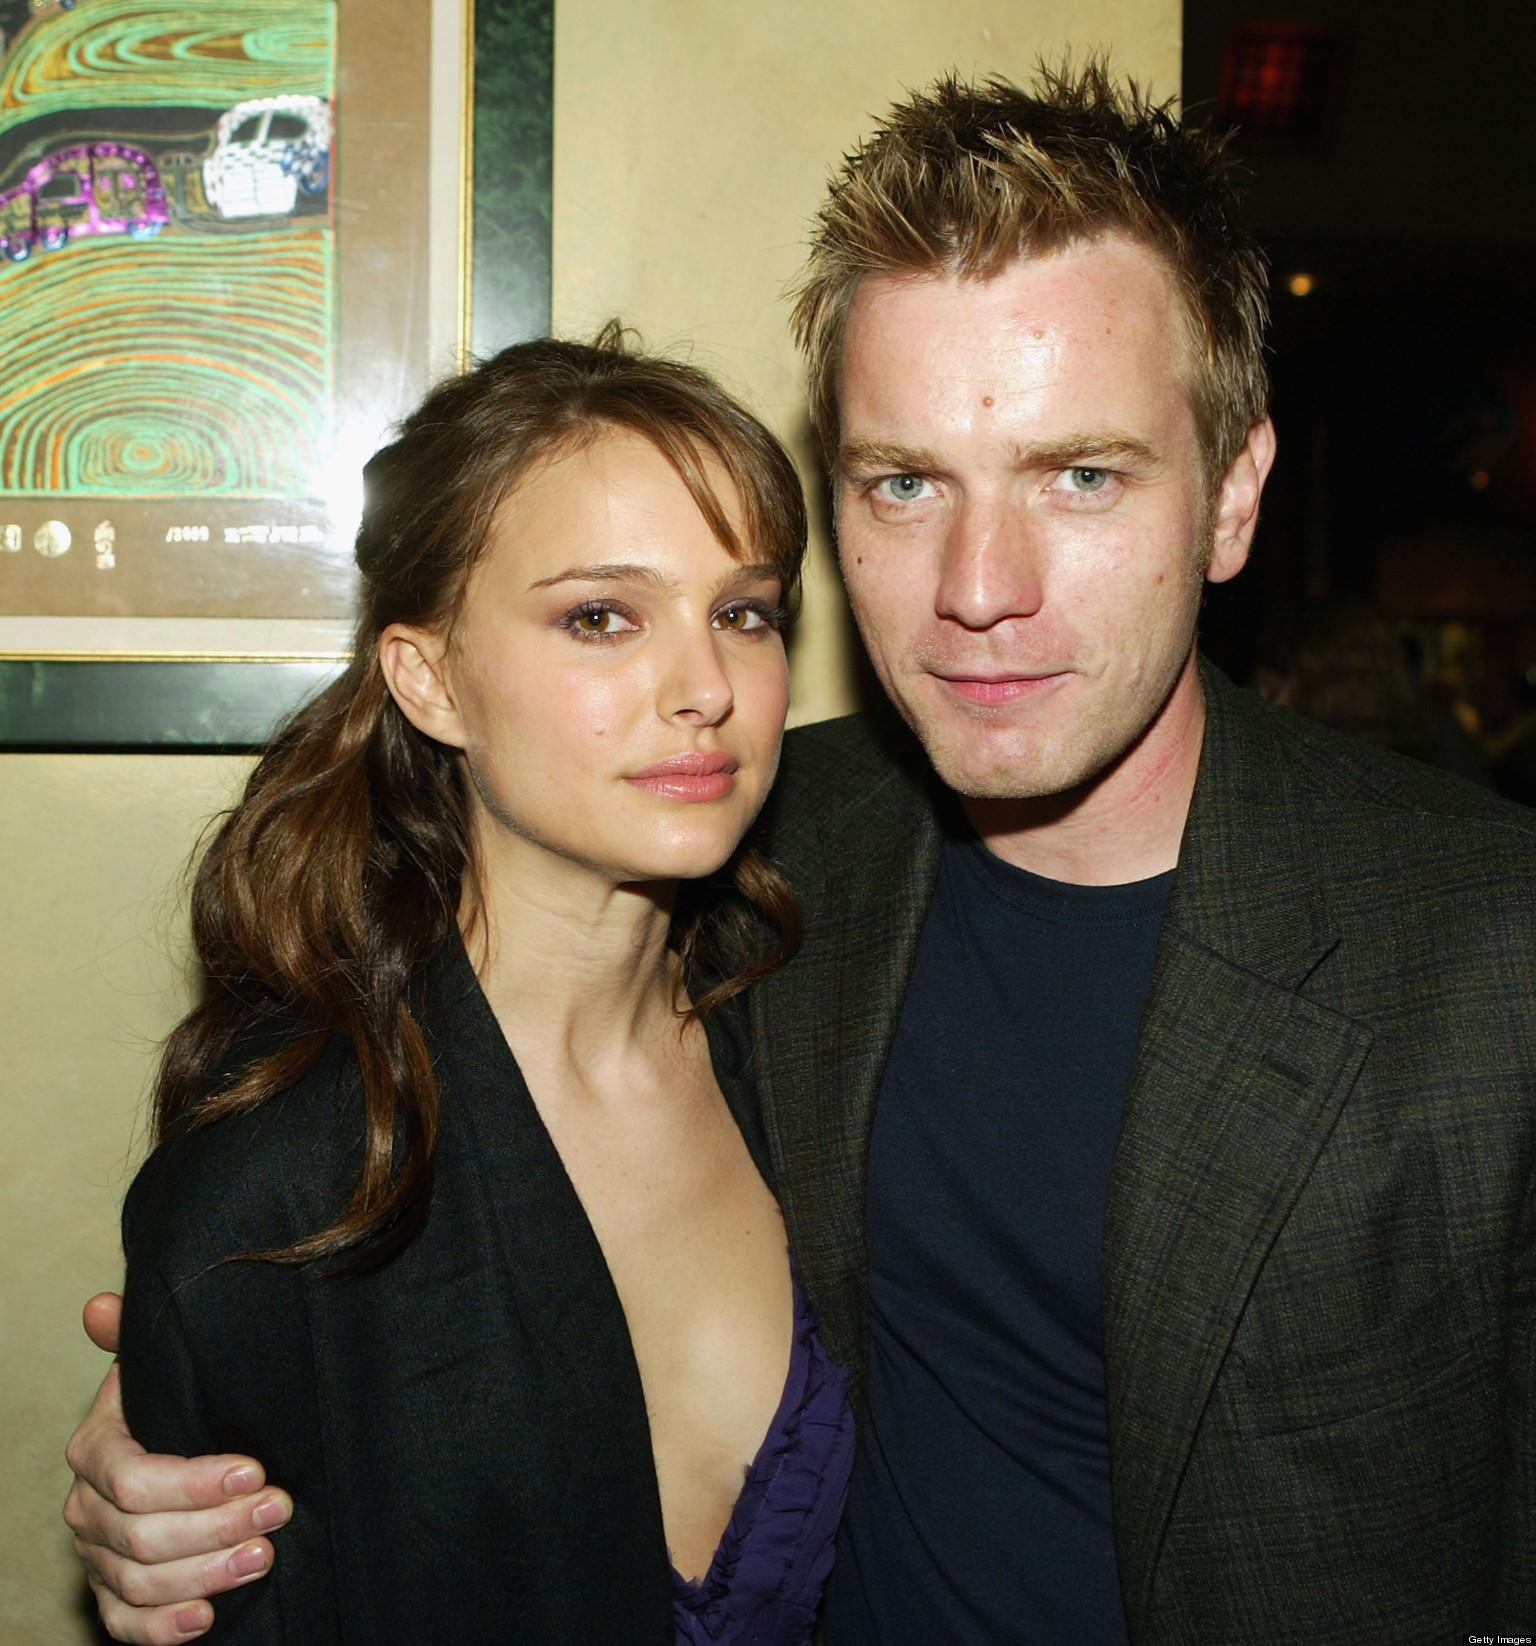 Ewan McGregor Reunites With Natalie Portman